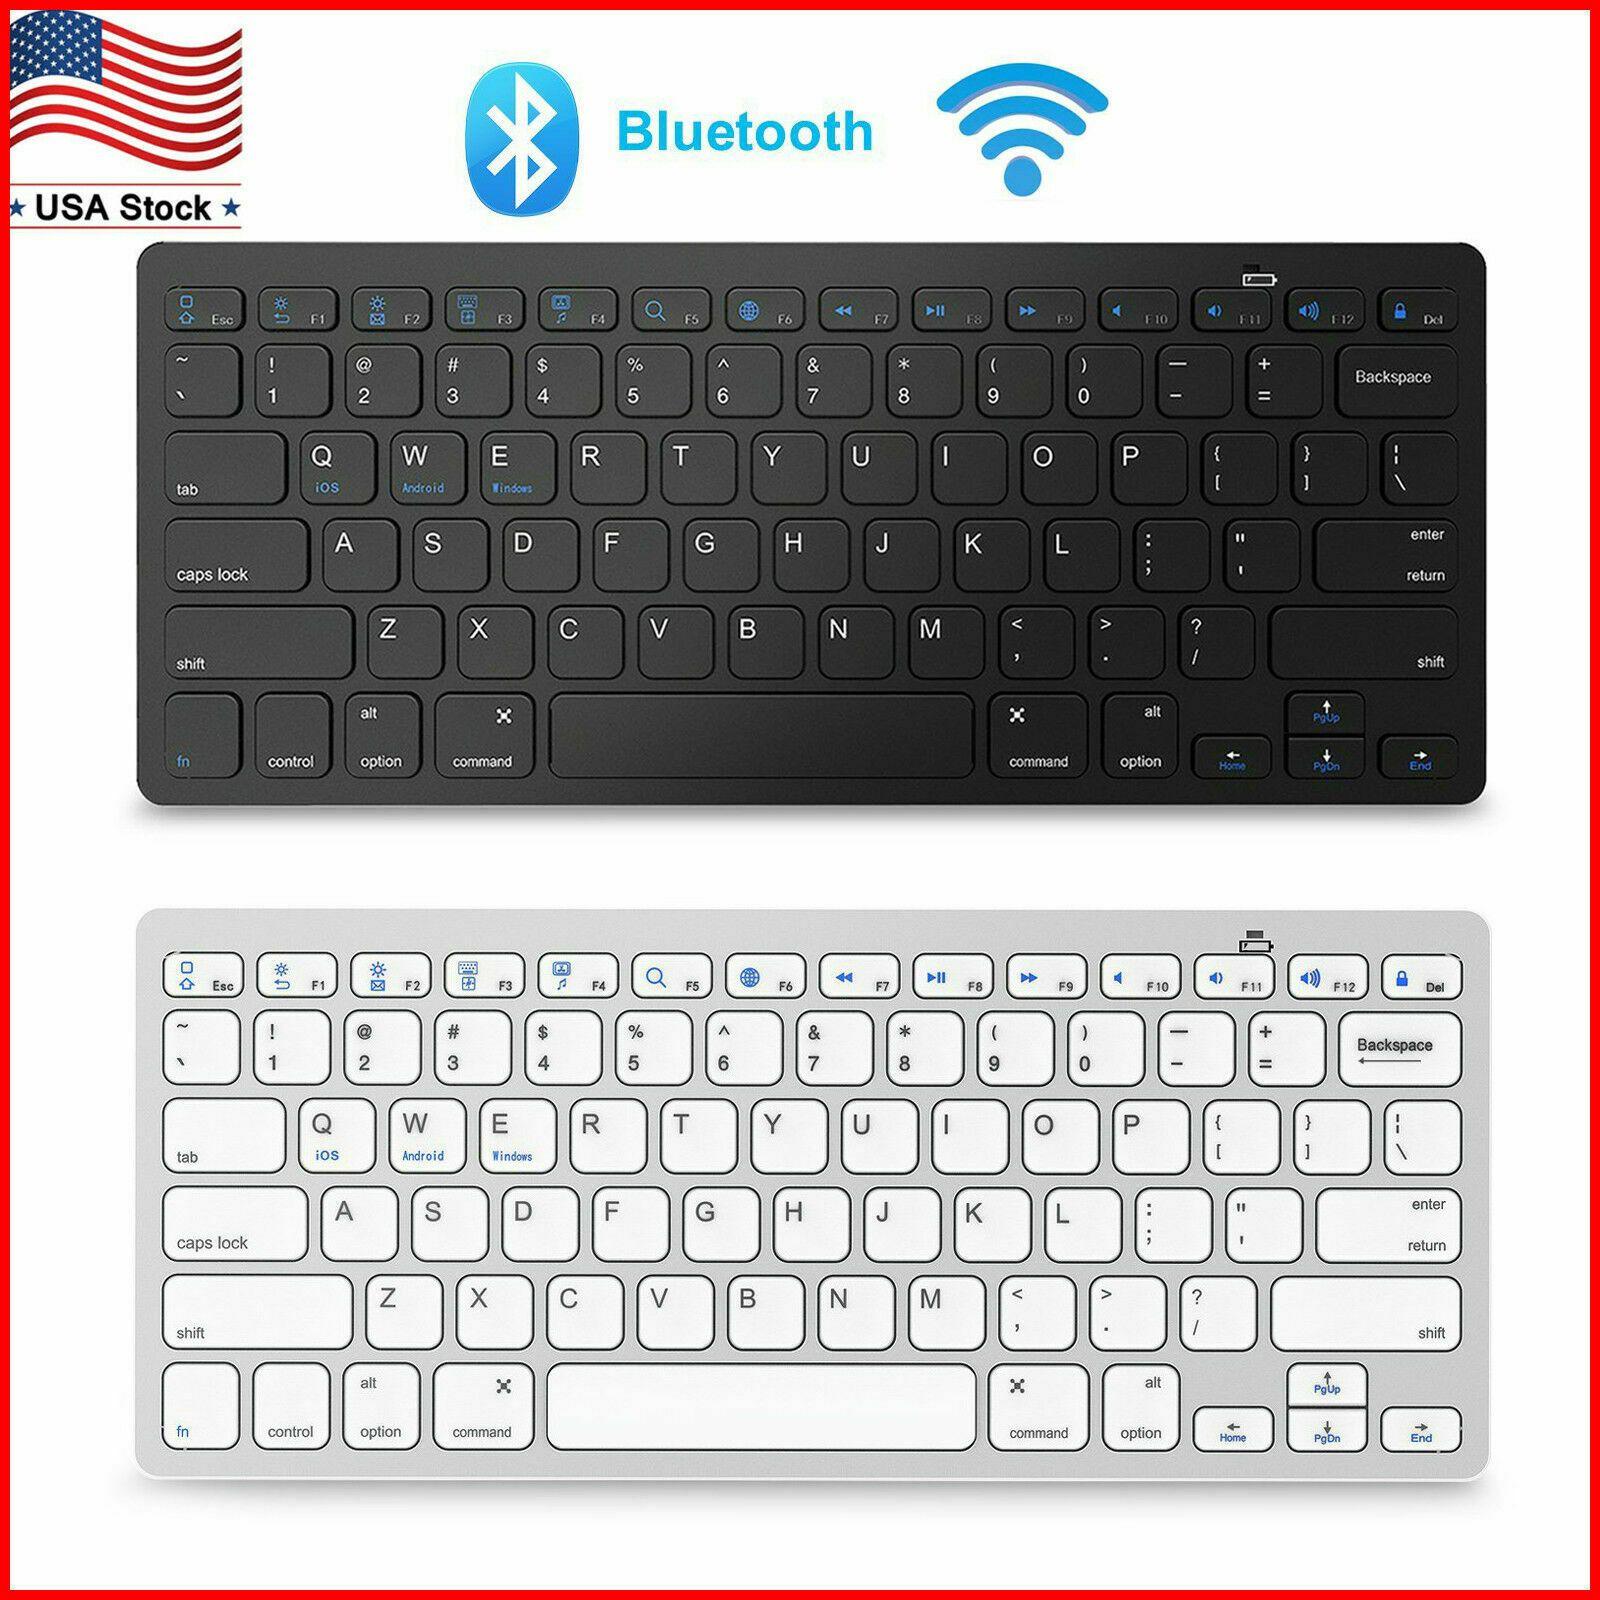 Details about Universal Slim Wireless Bluetooth Keyboard